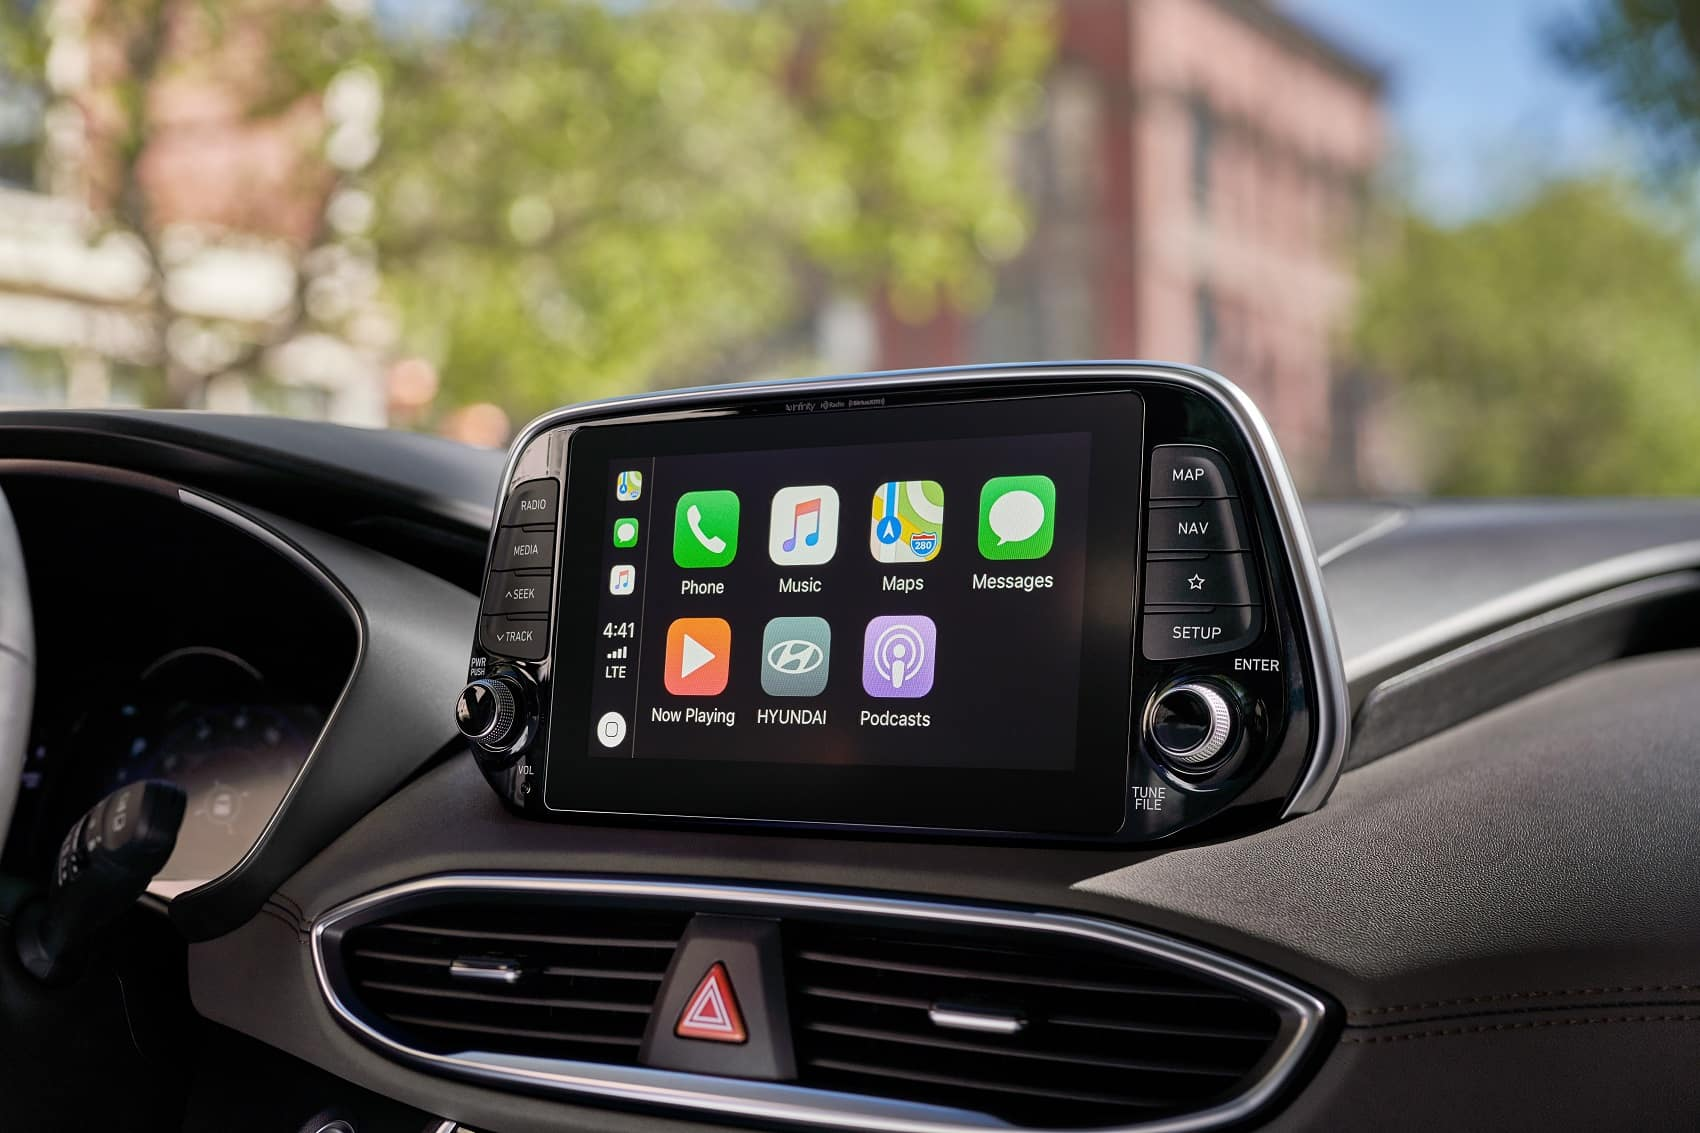 Hyundai Santa Fe Interior with Apple CarPlay Technology